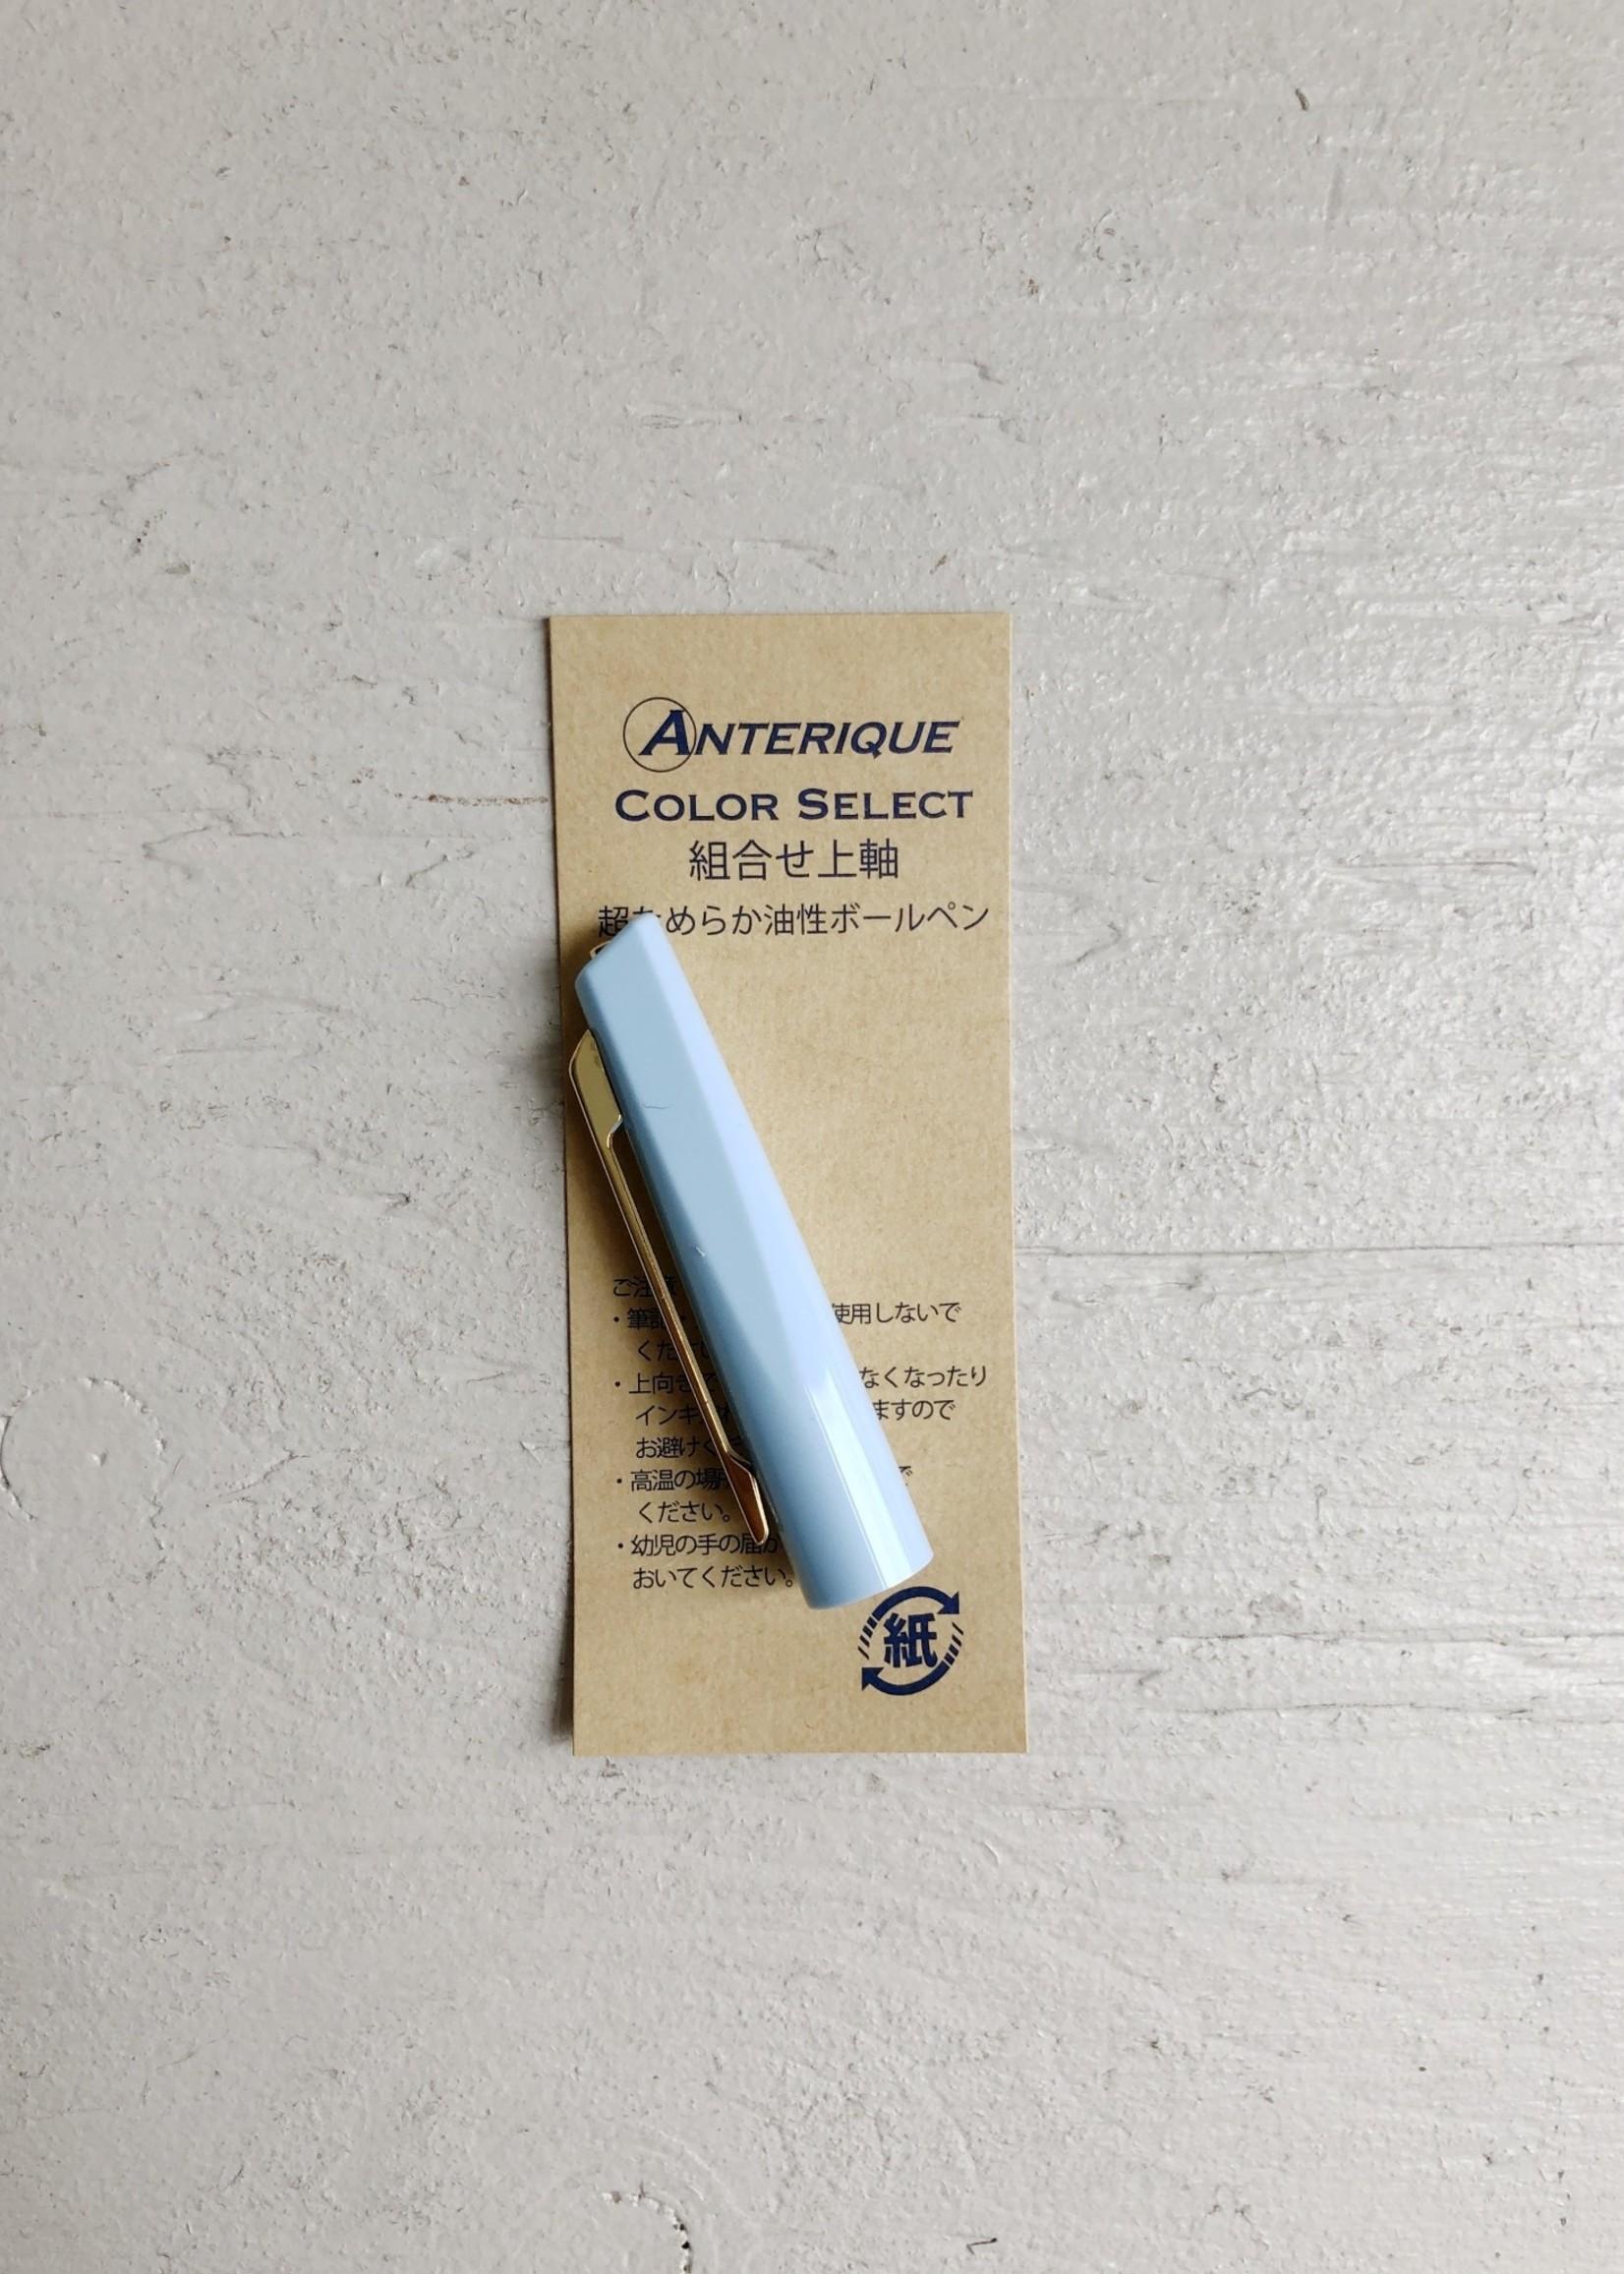 Anterique Upper Body Ballpoint Pen by Anterique